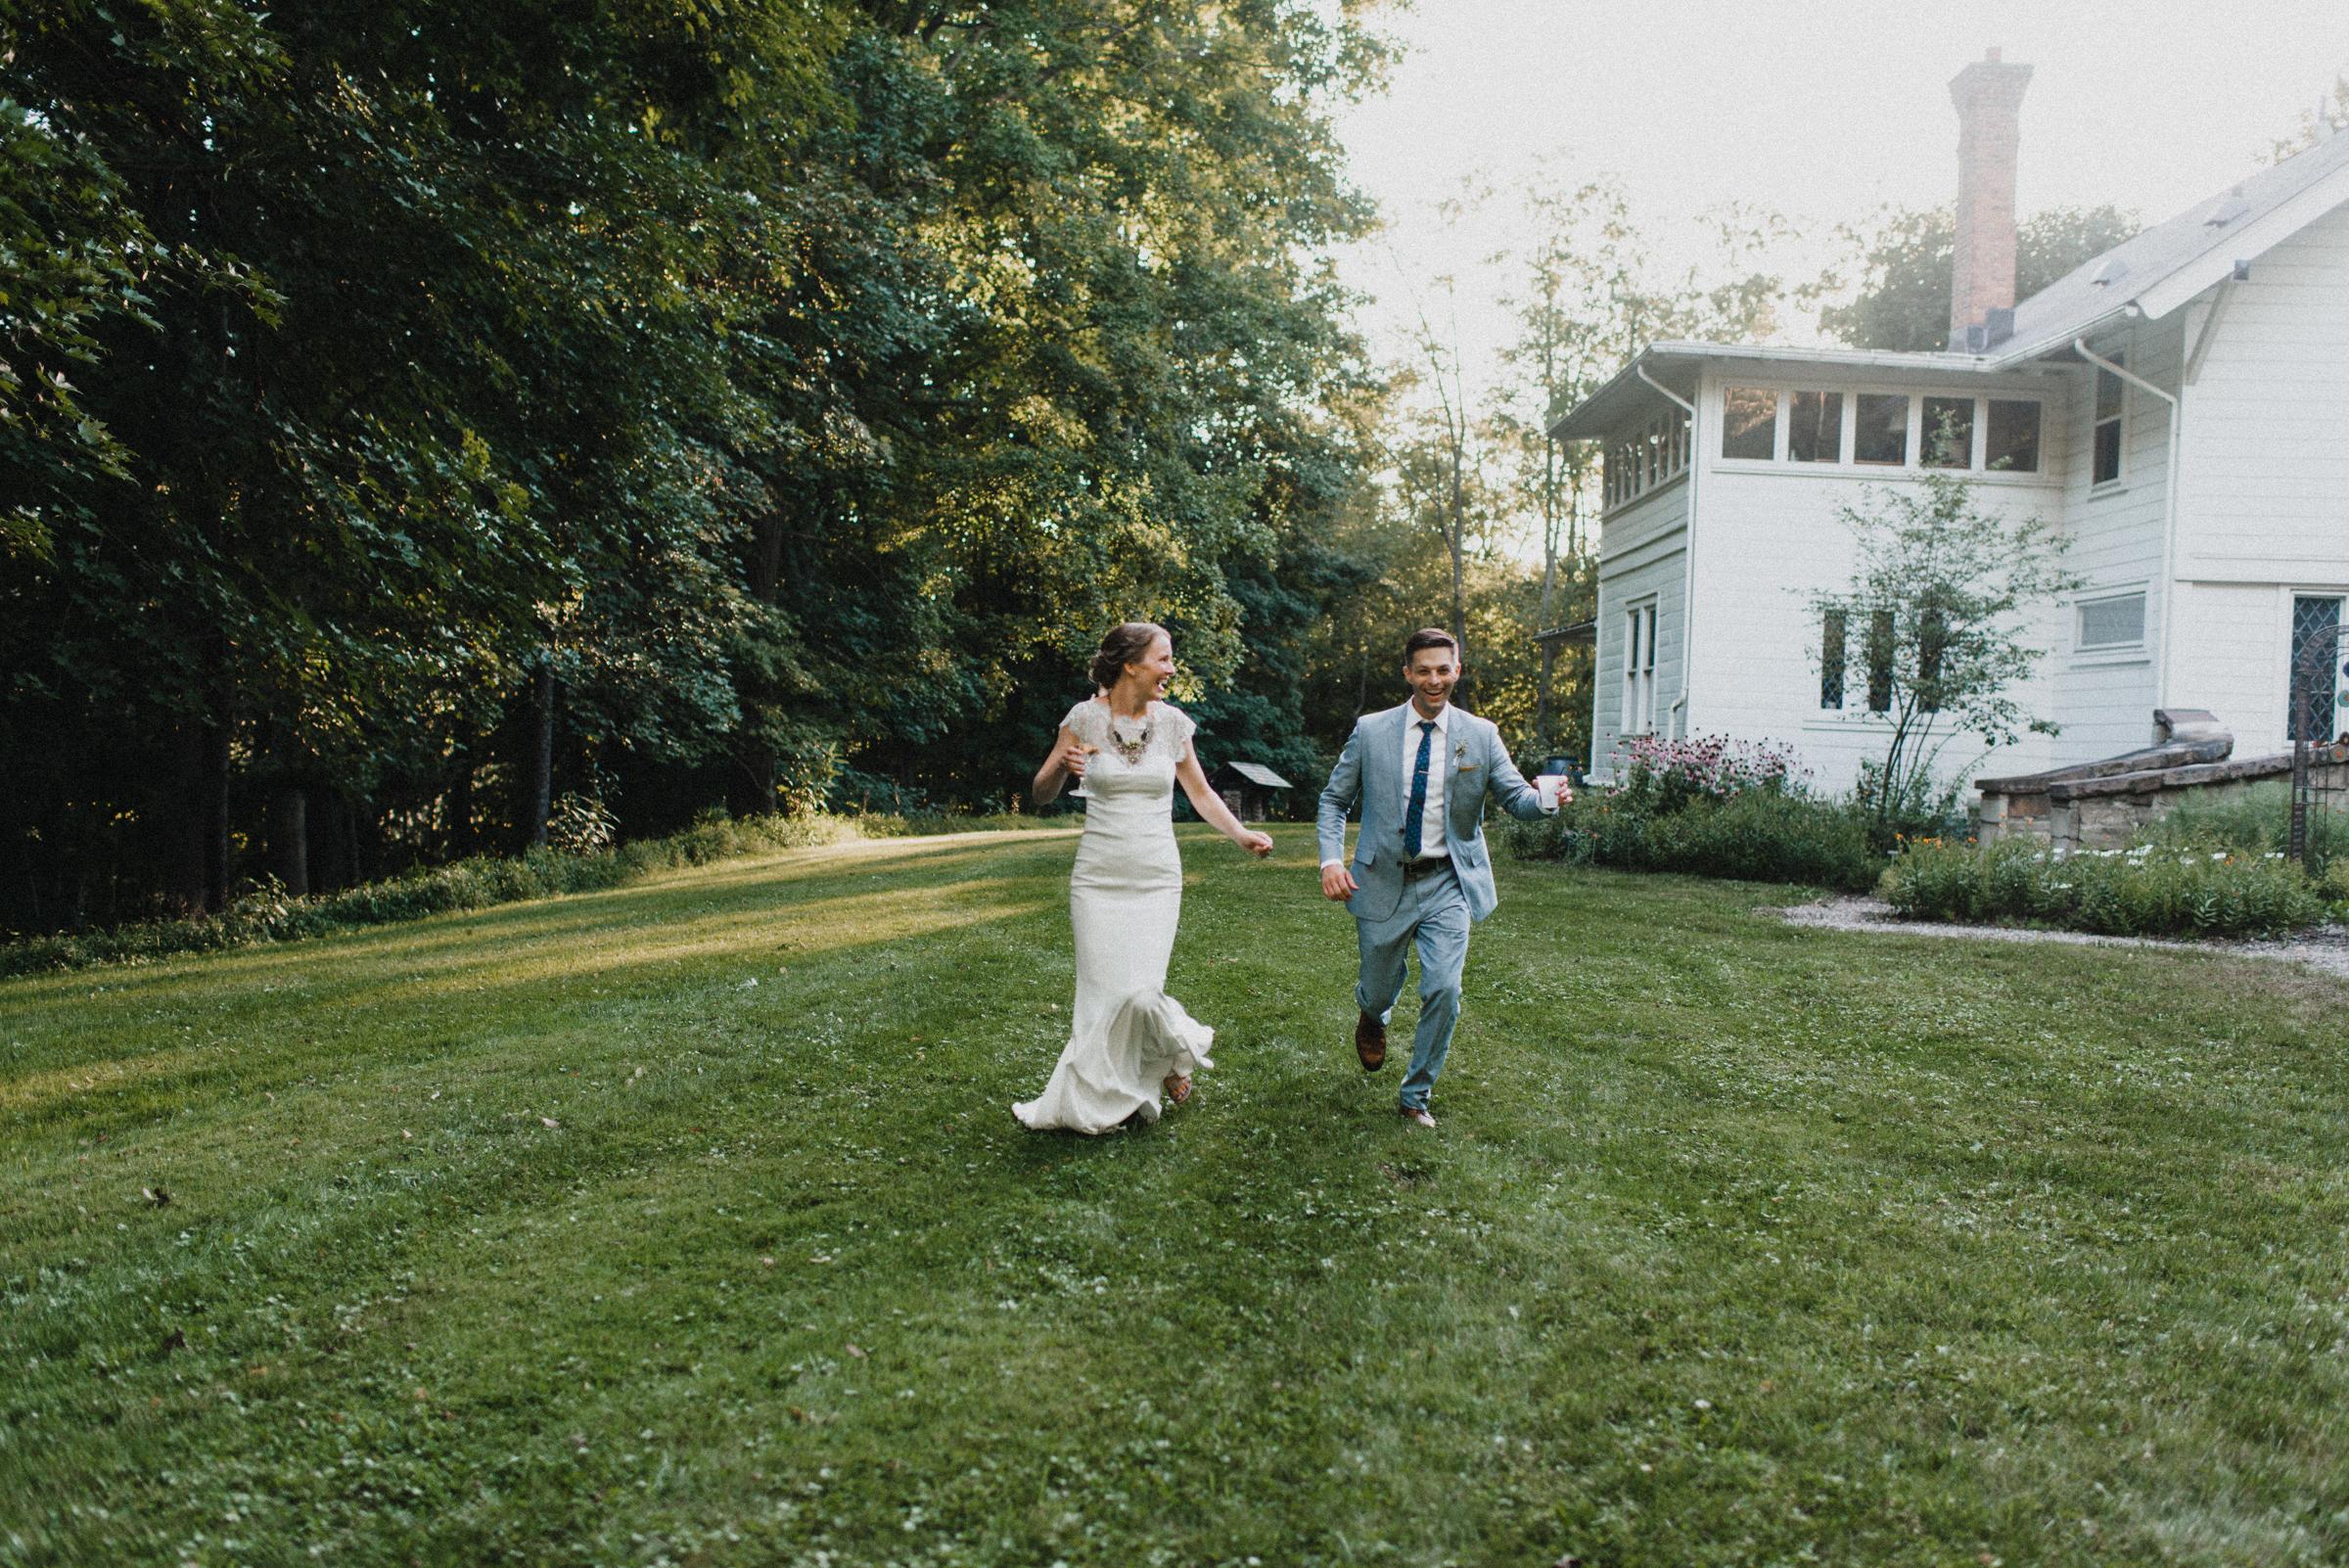 Intimate-Backyard-Farmhouse-Ohio-Wedding-Andi+Ben_Mallory+Justin-Photographers-236.JPG